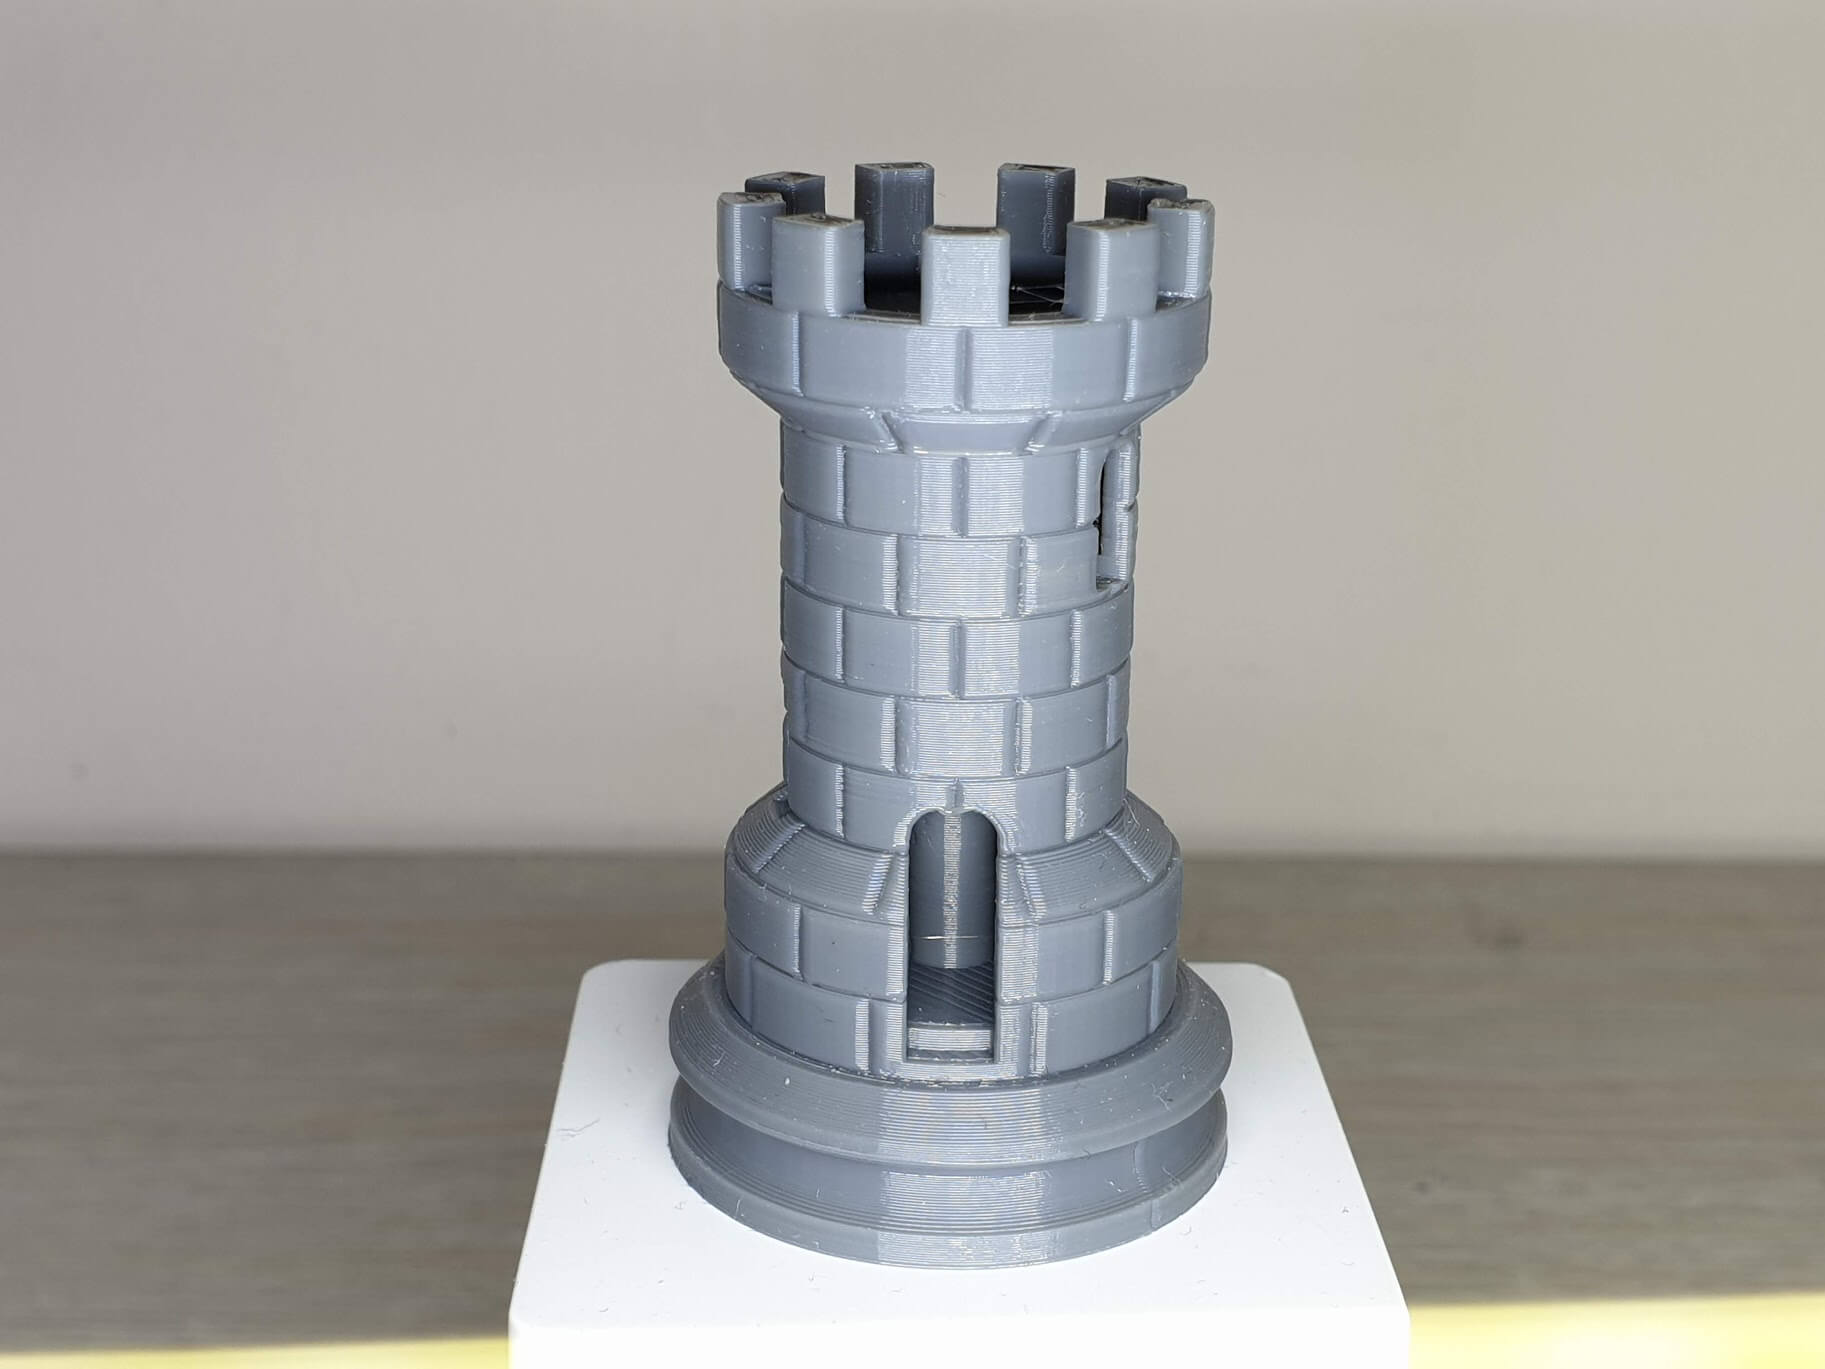 Rook with IdeaMaker Profile on Artillery Genius 1 | IdeaMaker Profiles for Sidewinder X1 and Genius